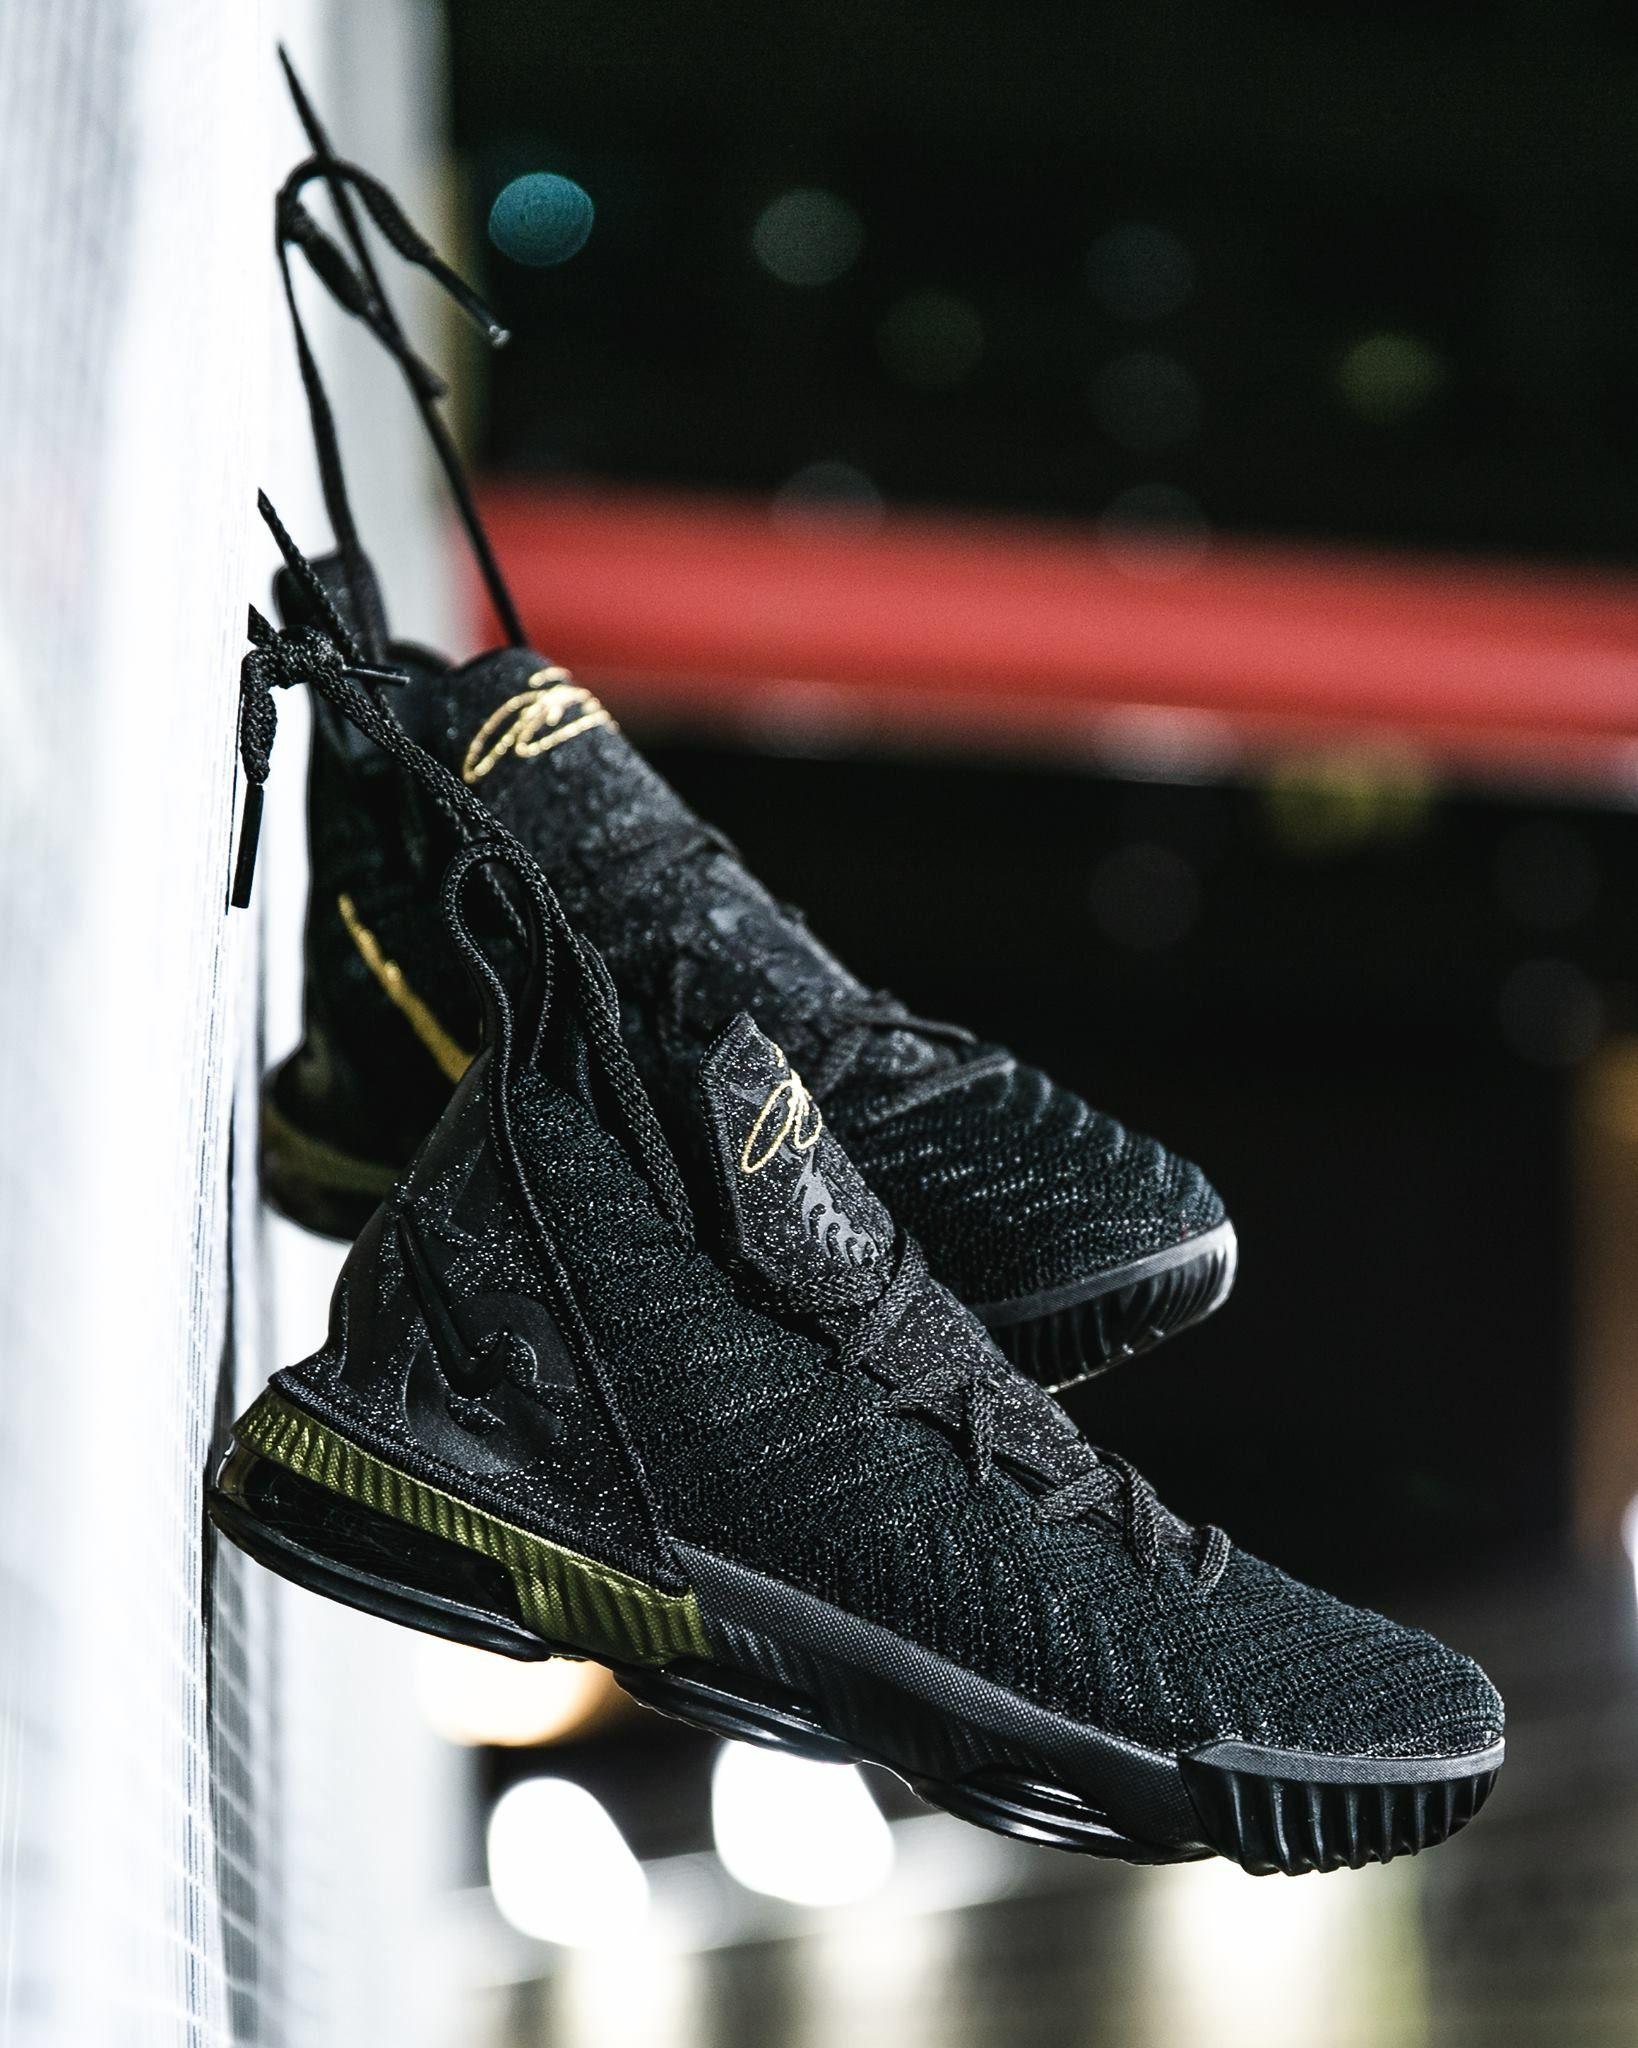 44c471d28c27 Nike LeBron King